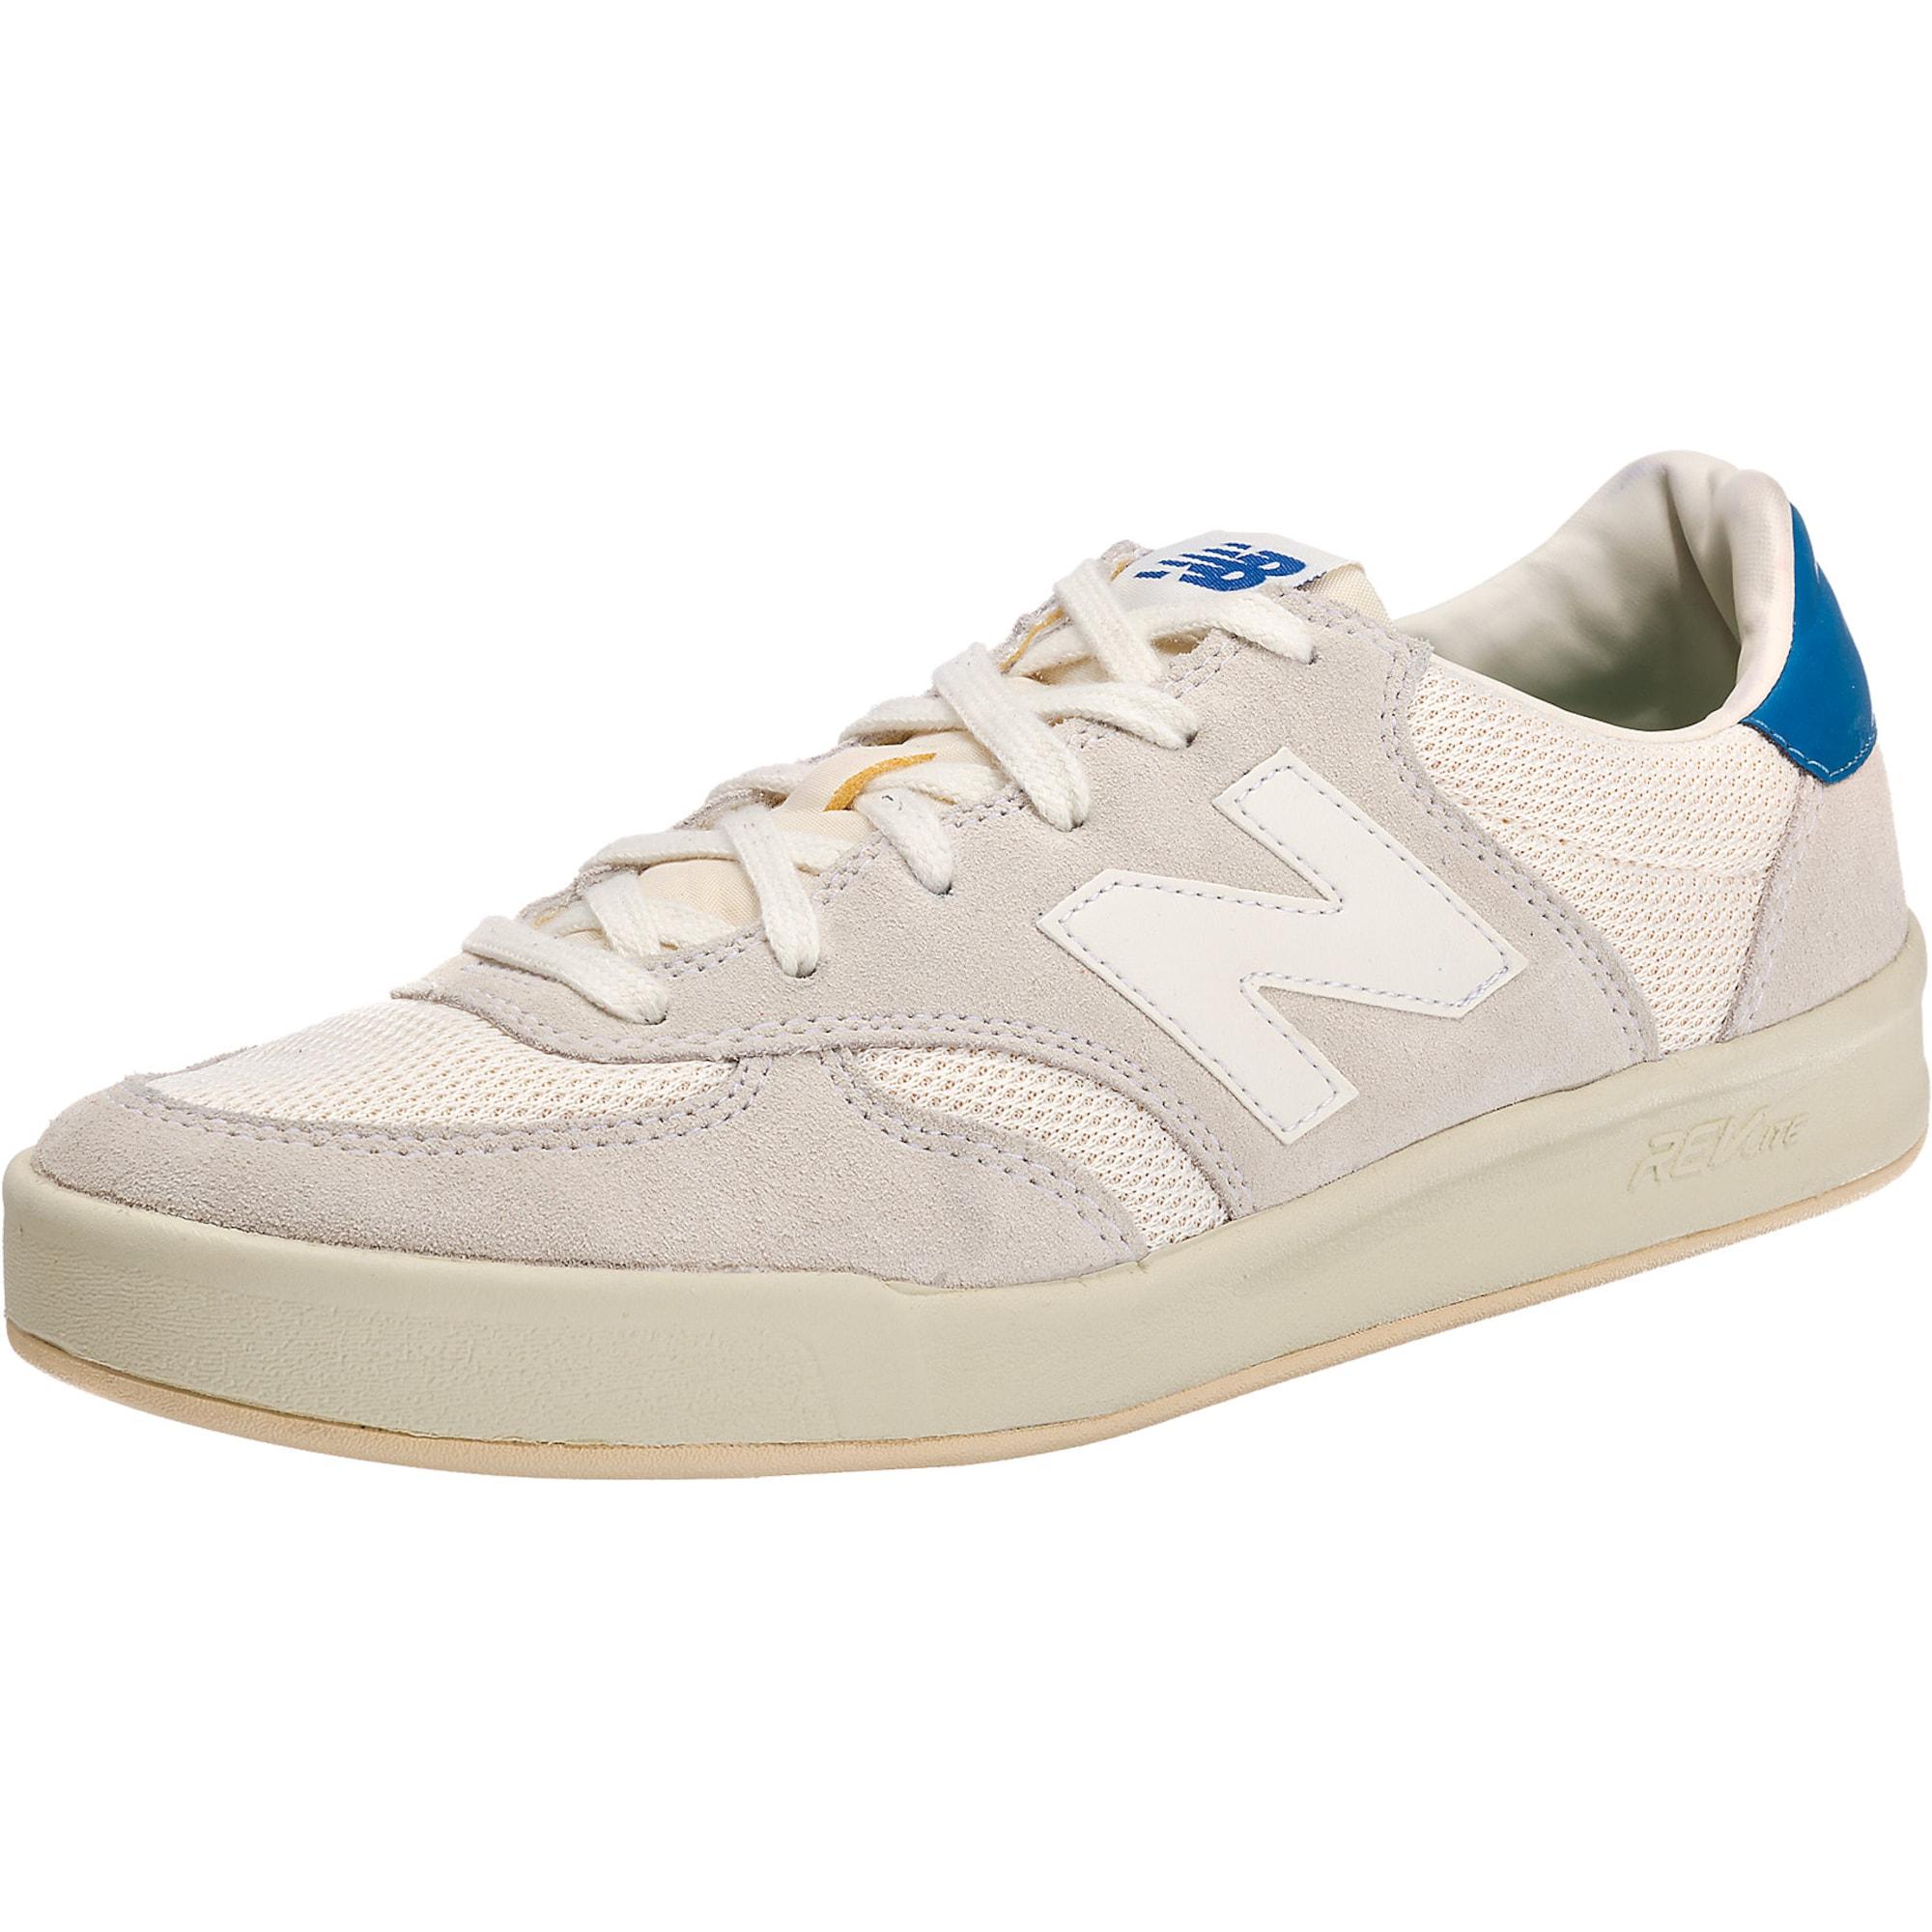 brand new ab296 25470 AboutYou   SALE Herren New Balance New Balance Sneakers ...